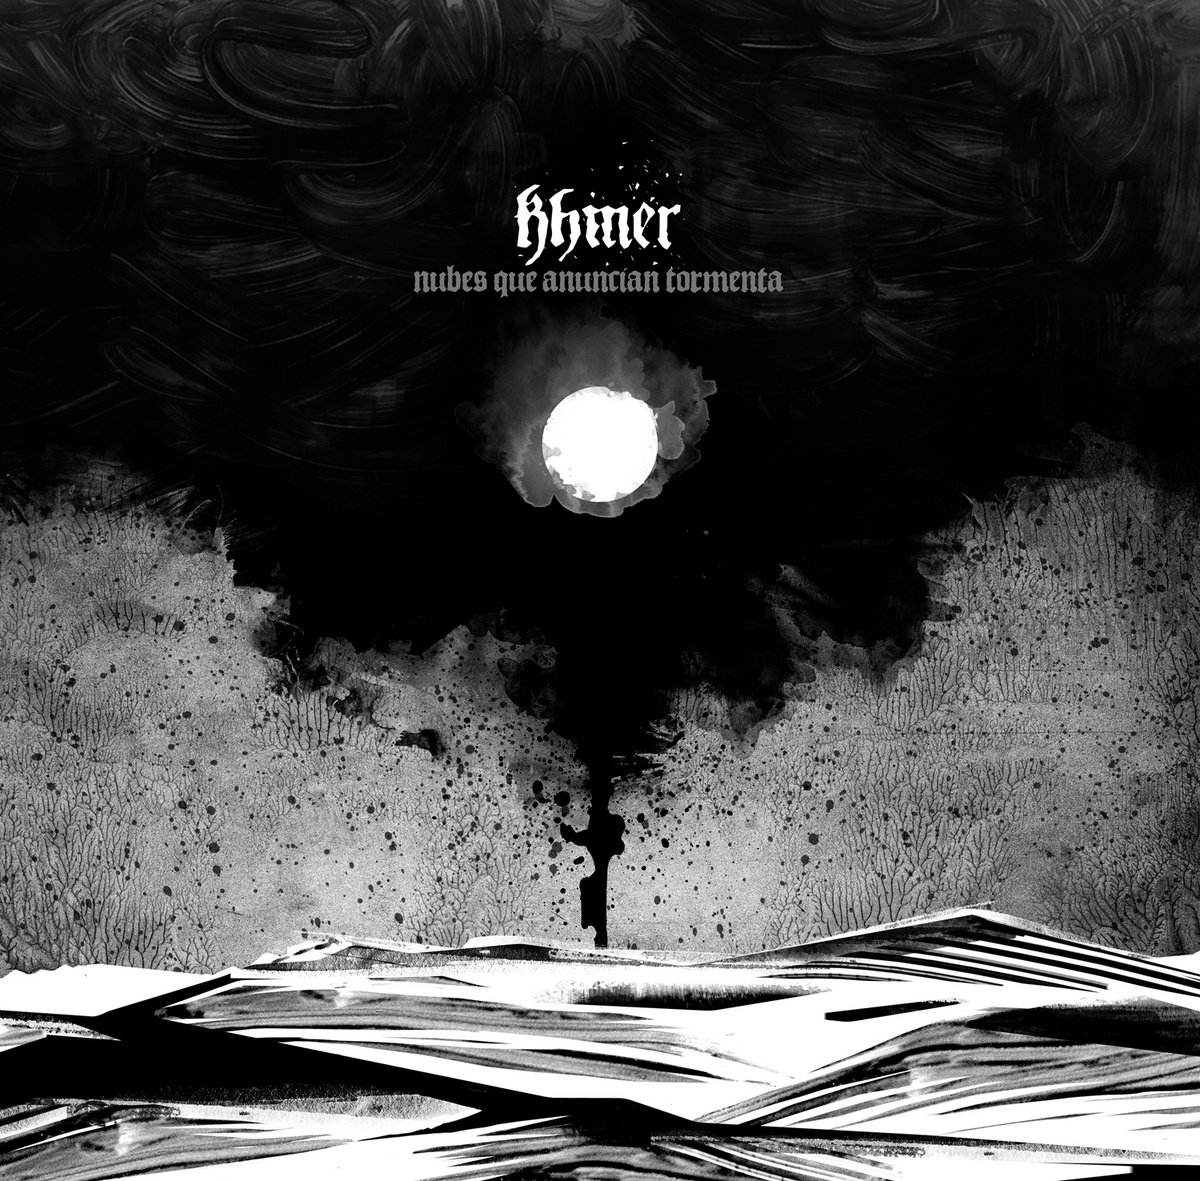 Khmer - Metales Que Guardas @ 'Nubes Que Anuncian Tormenta' album (metal, spain)